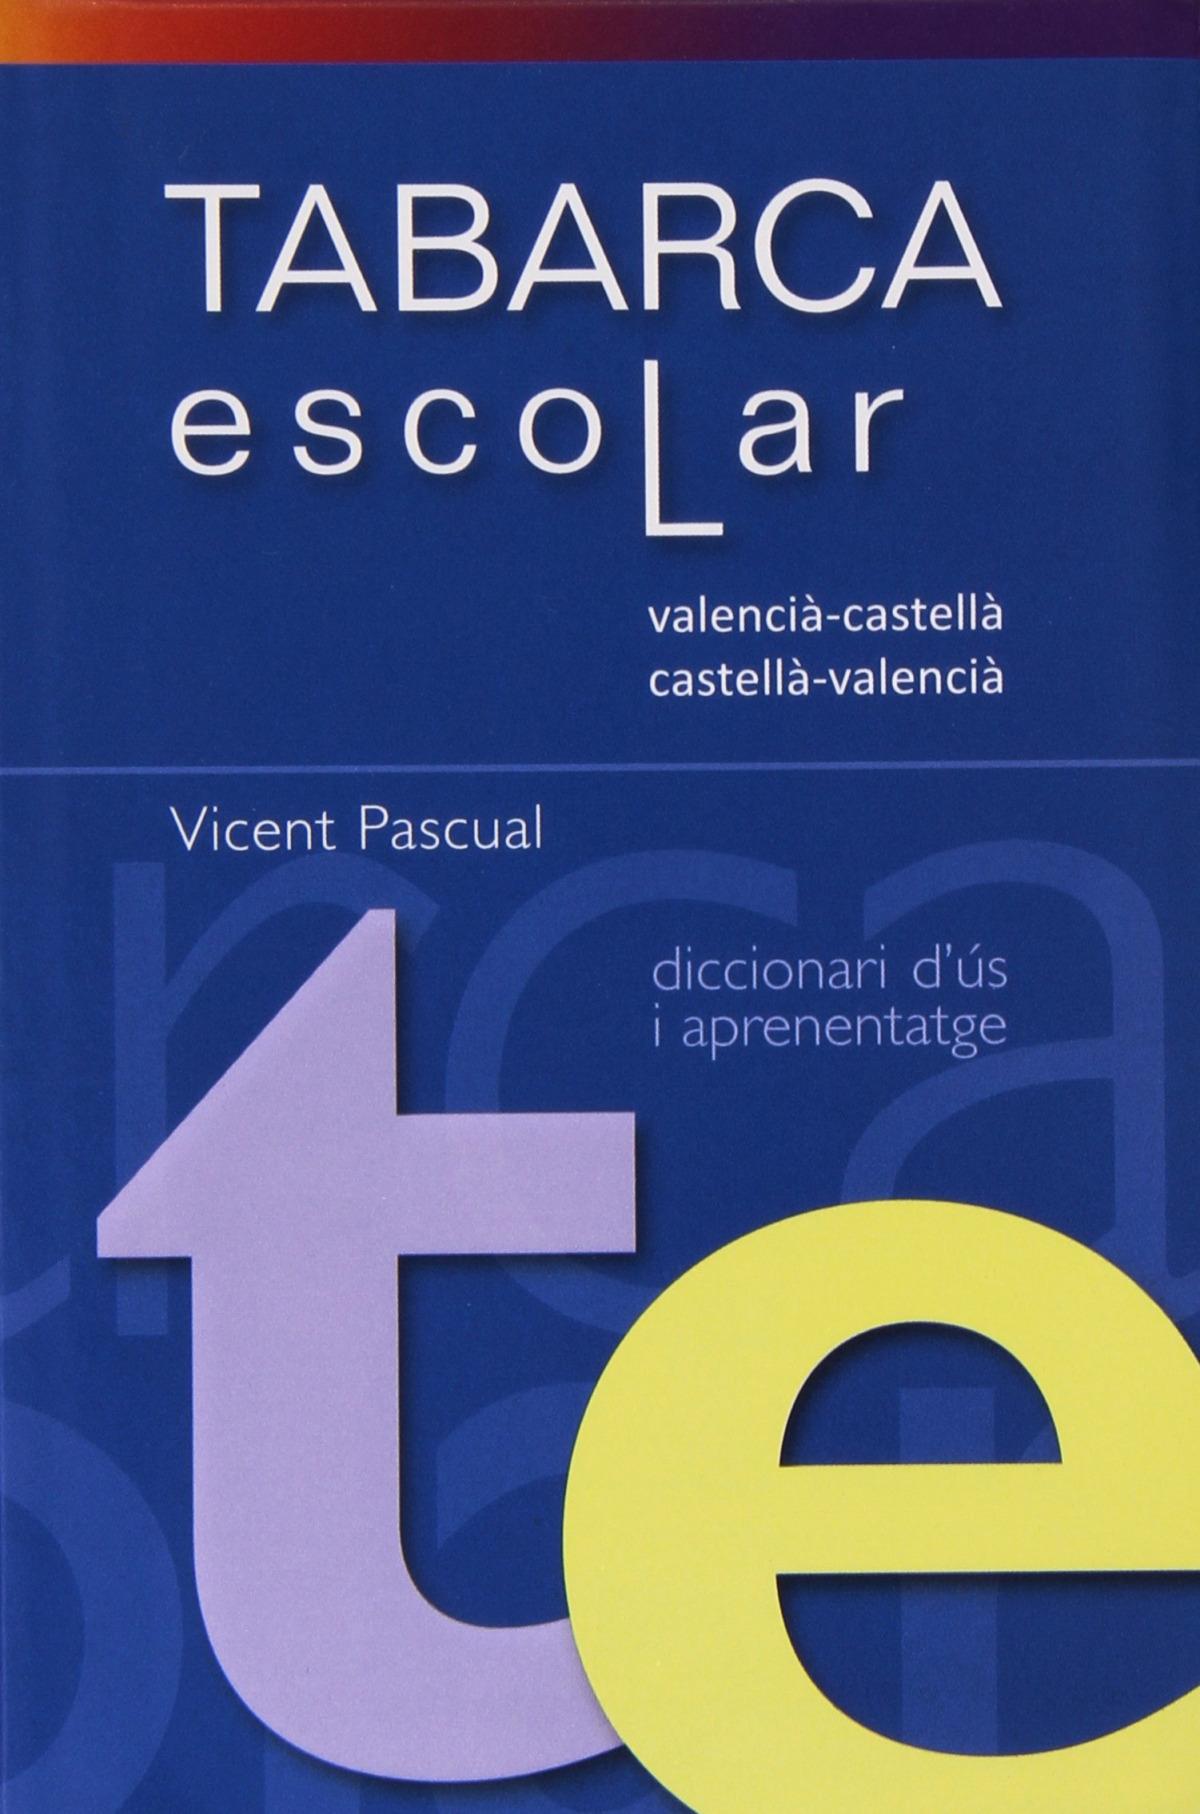 Diccionari escolar tabarca. Valencia-Castella.VV 9788480253307